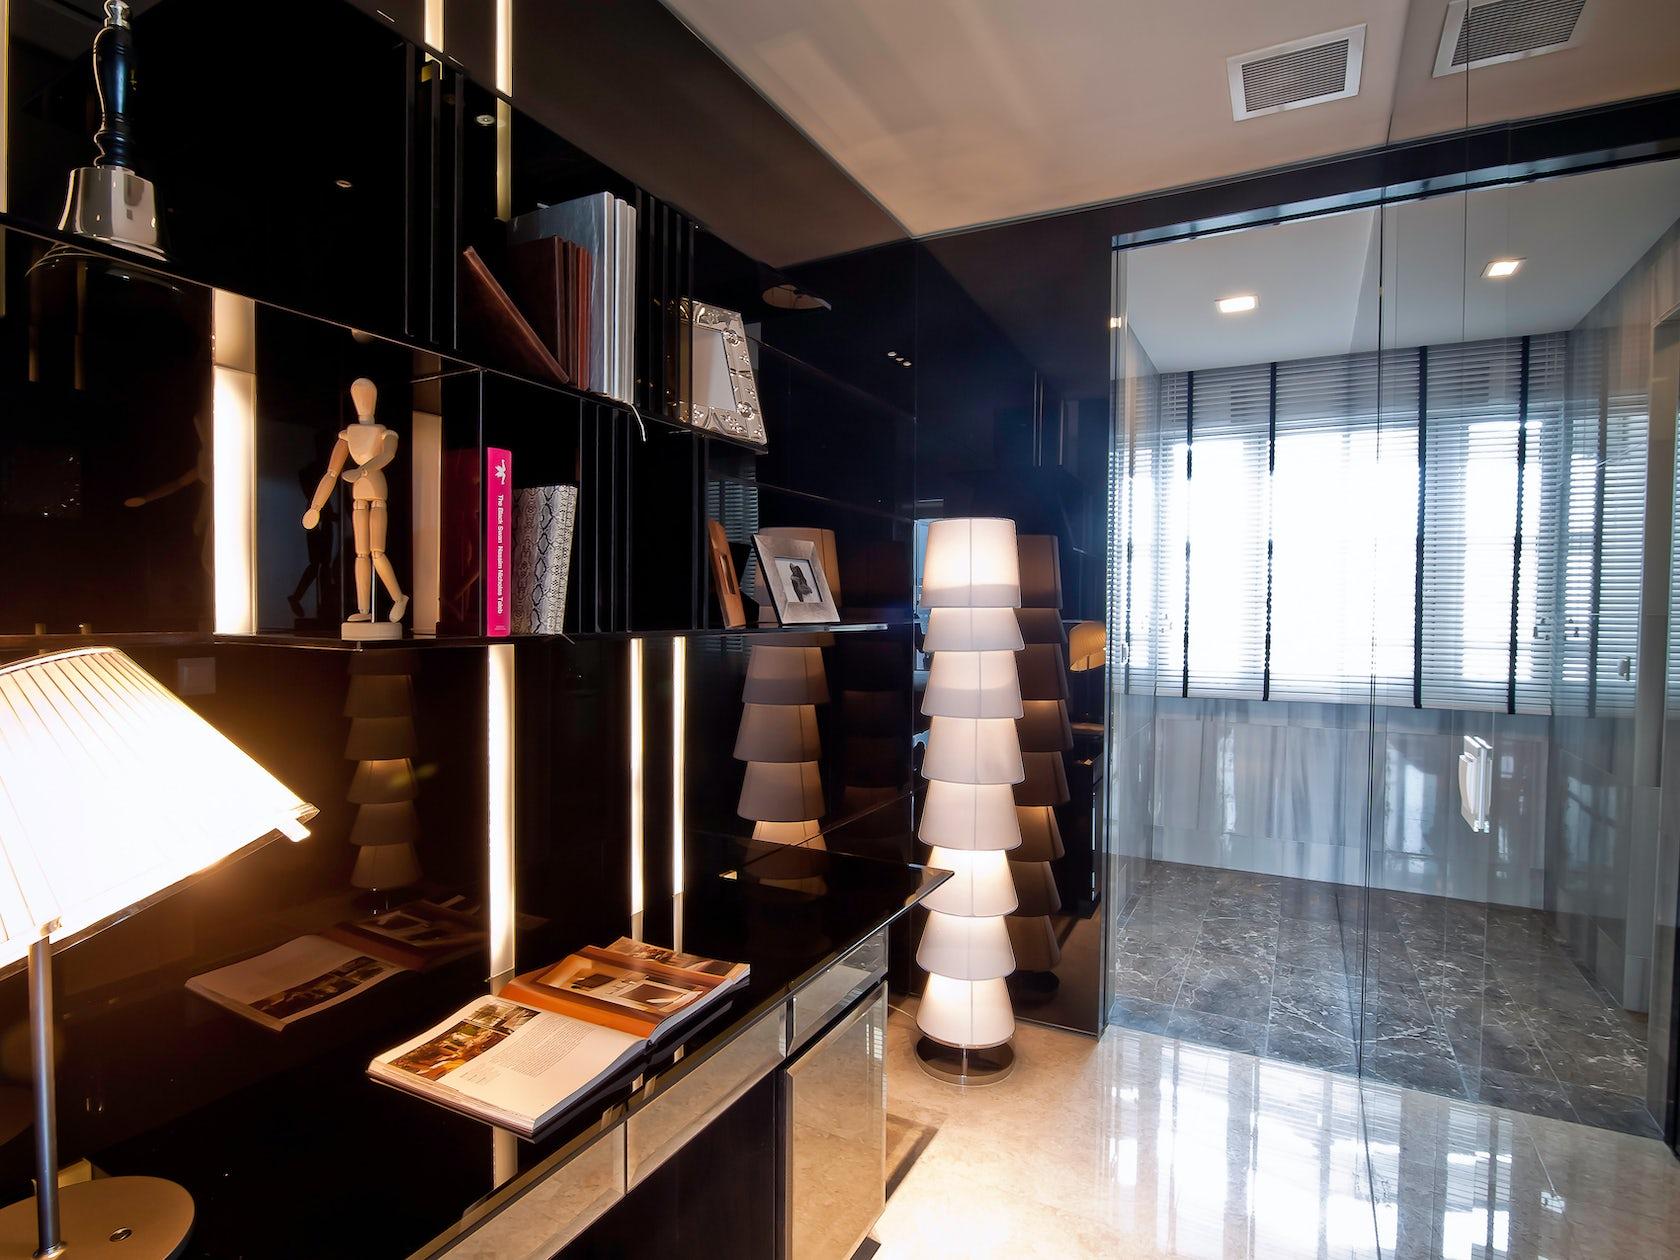 Grange infinite showflat architizer - Appartement grange infinite showflat singapour ...